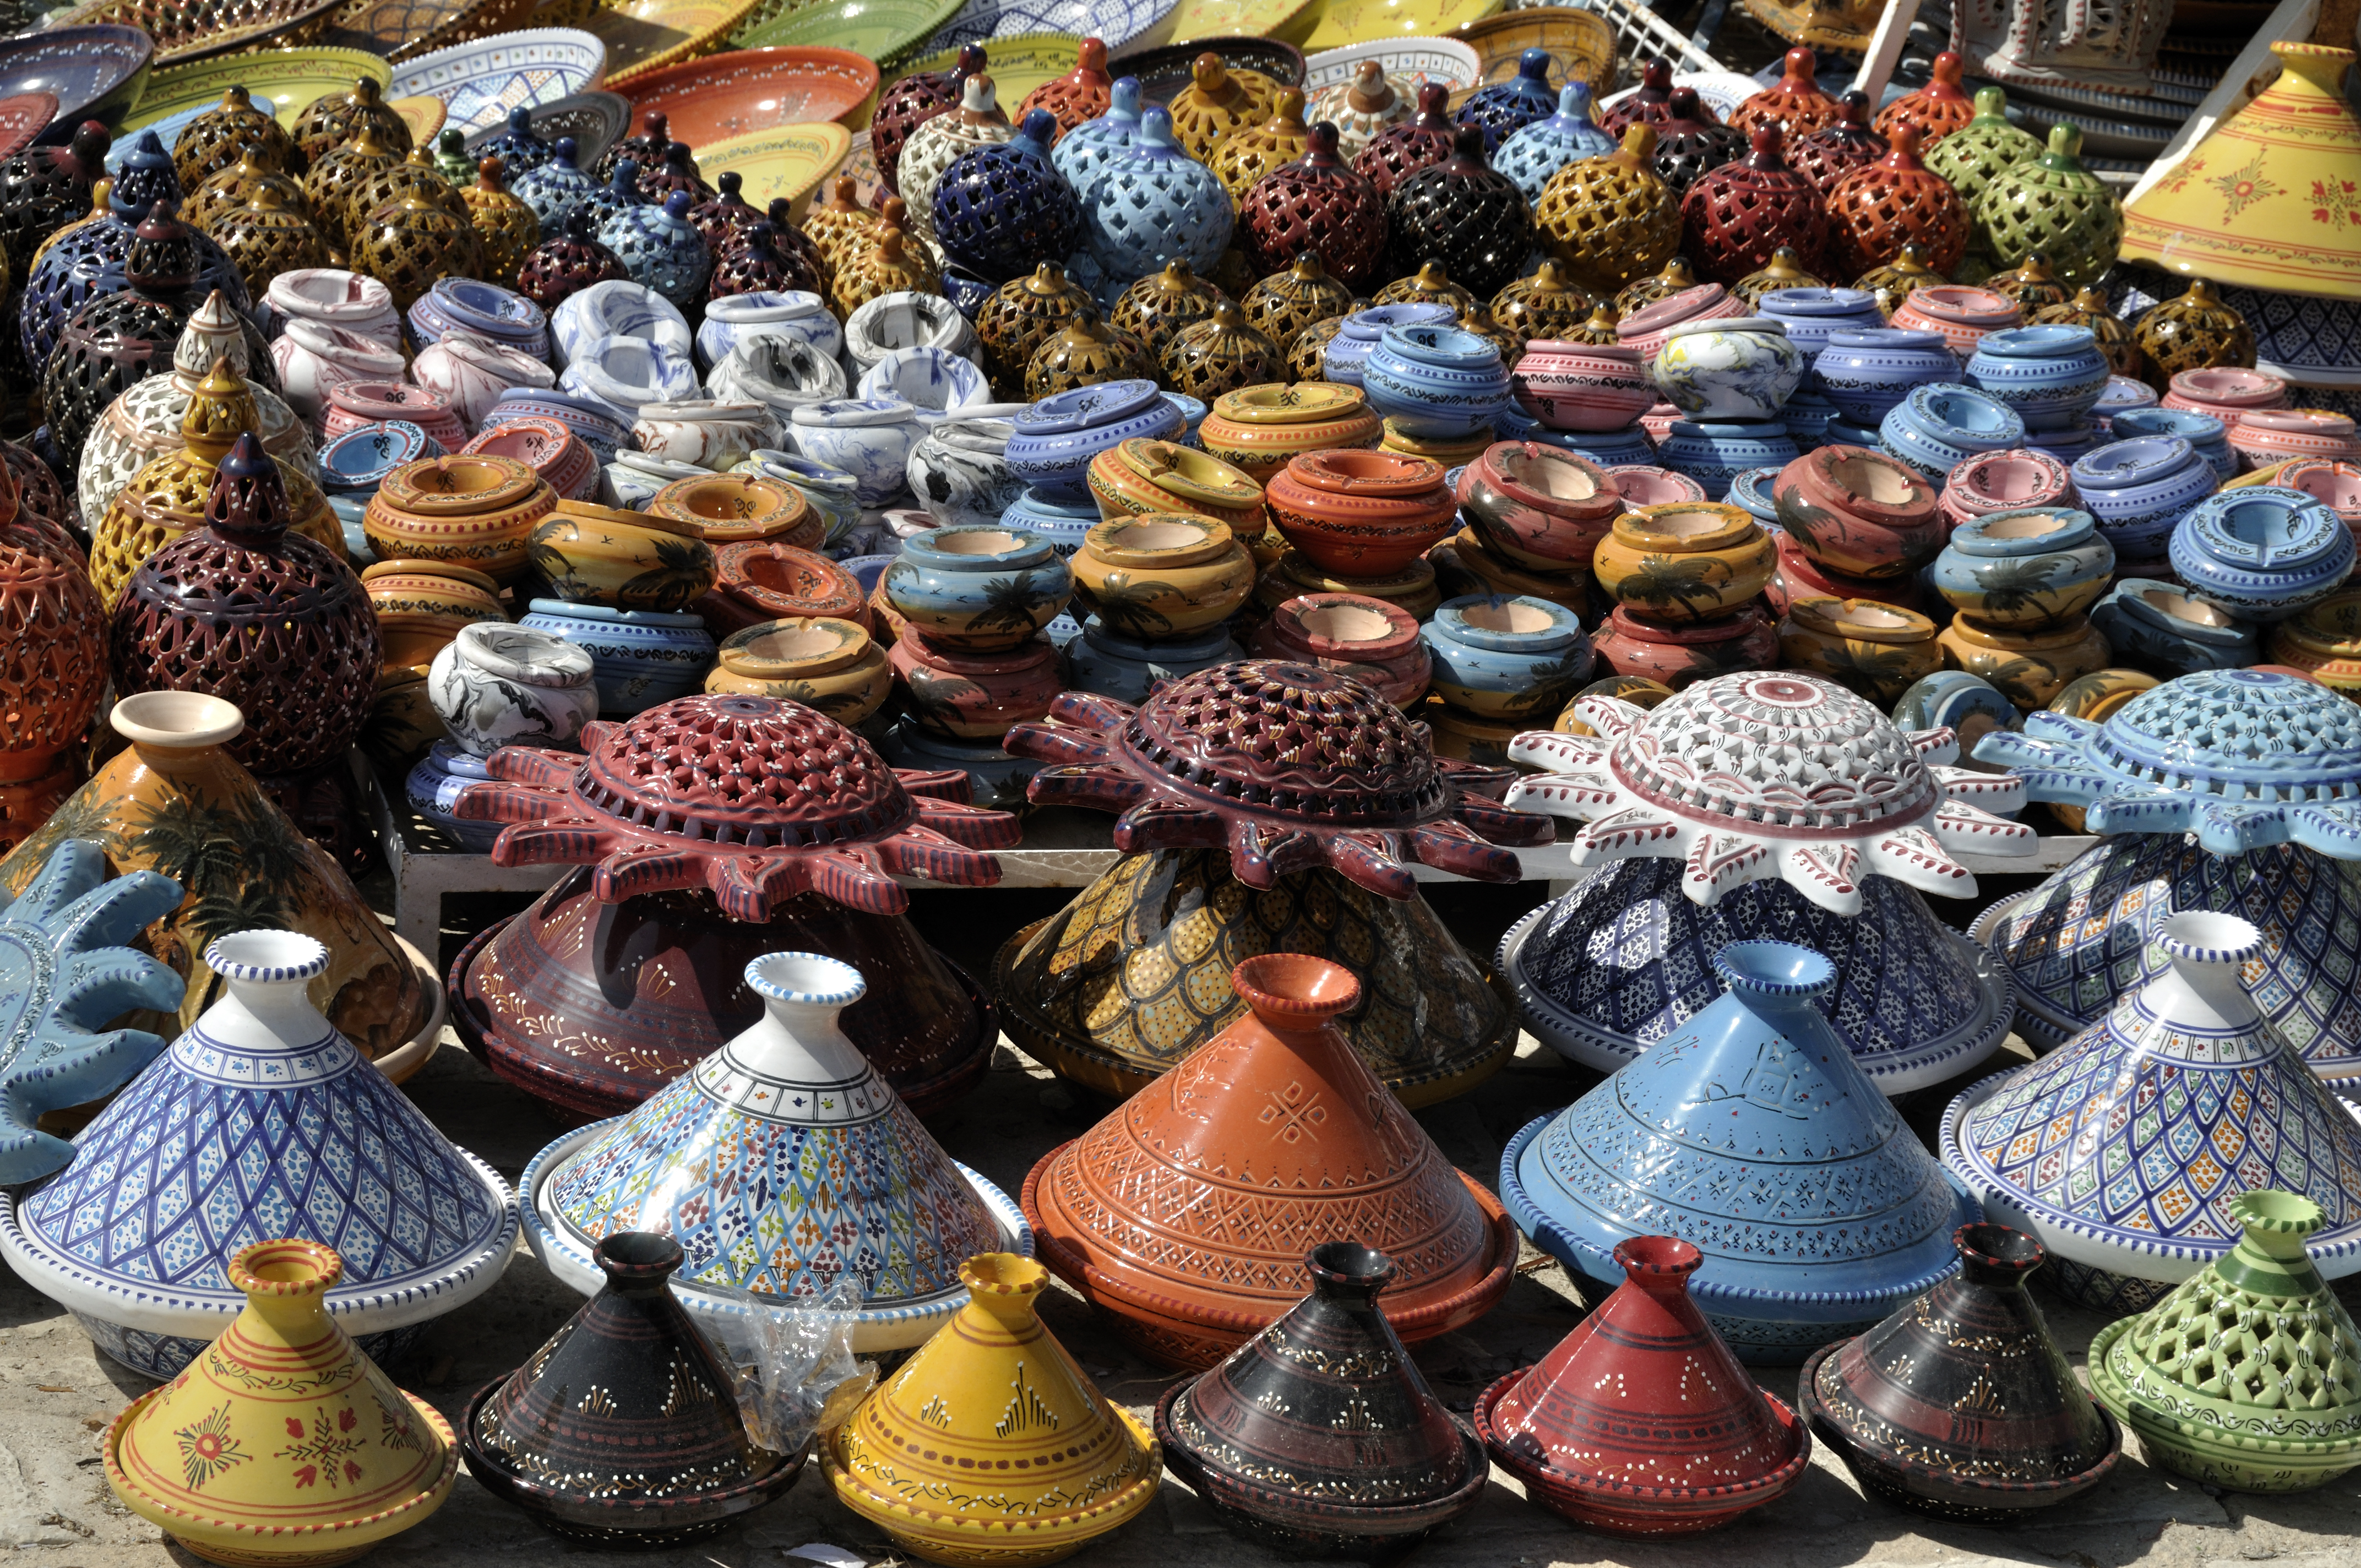 Tunisia pottery on sale in local souks